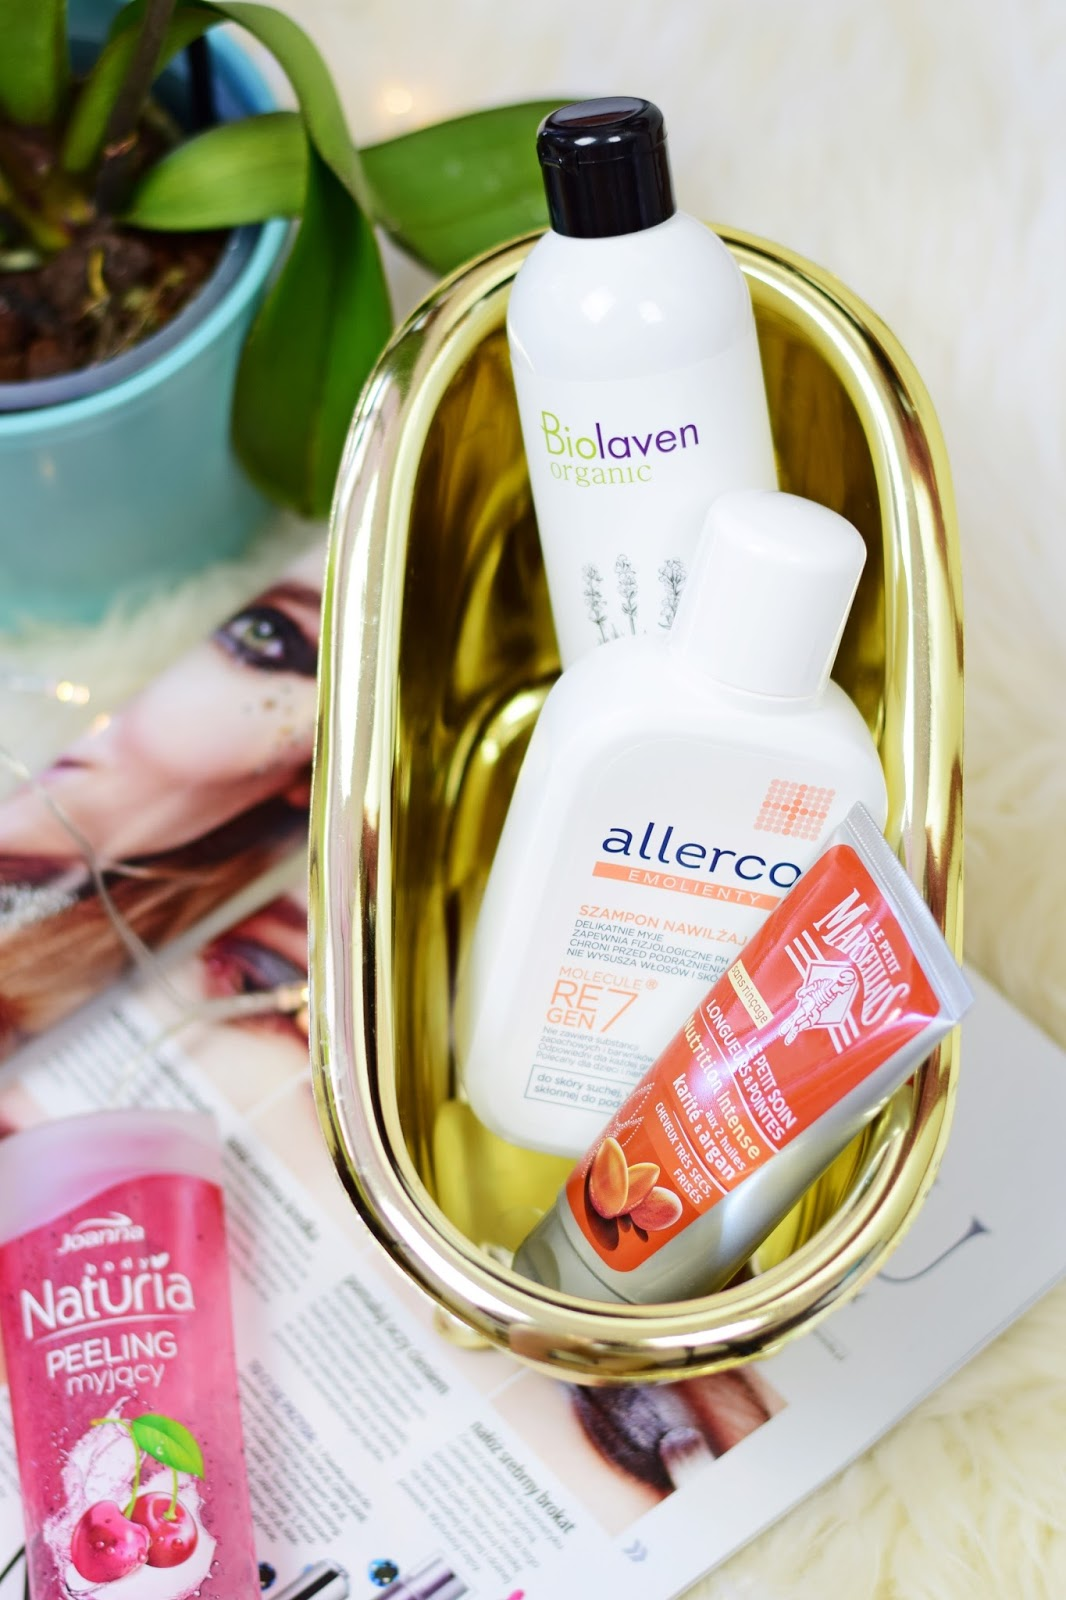 szampon_biolaven_allerco_odżywka_la_petite_marseillas_blog